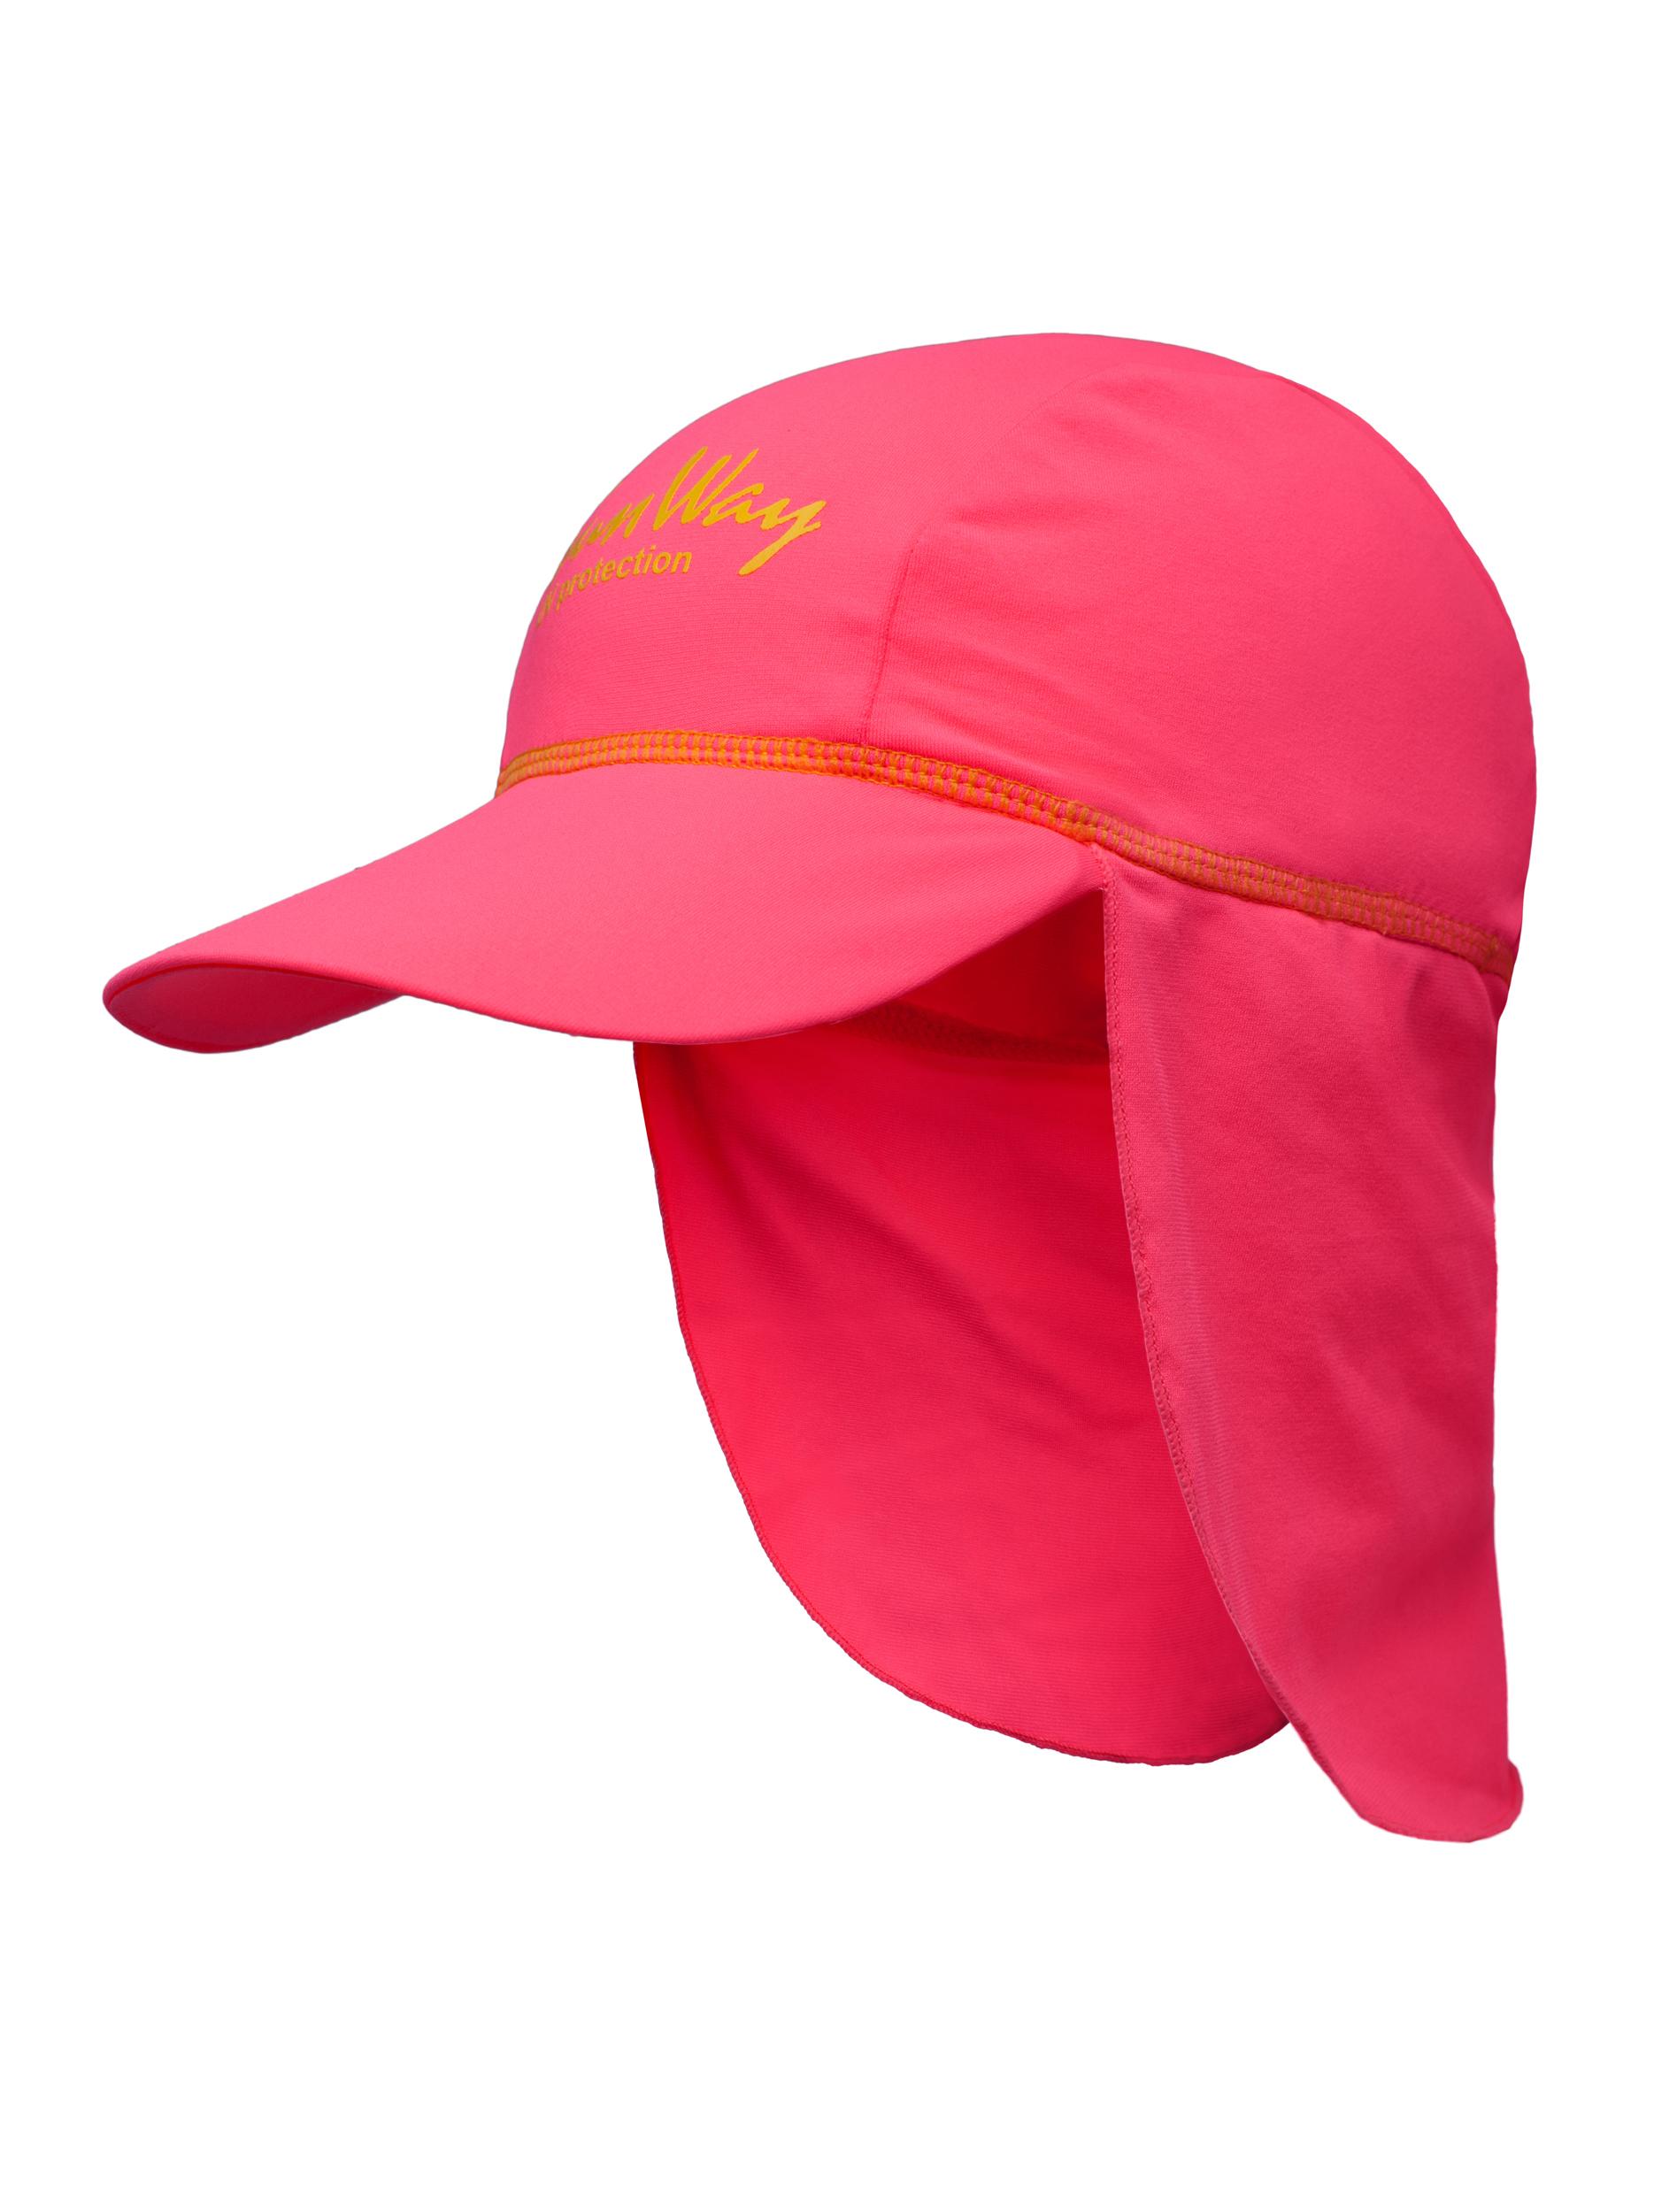 SunWay s UV Protective Hats  Legionnaire UV Hat for Girls 06ea7d634fd